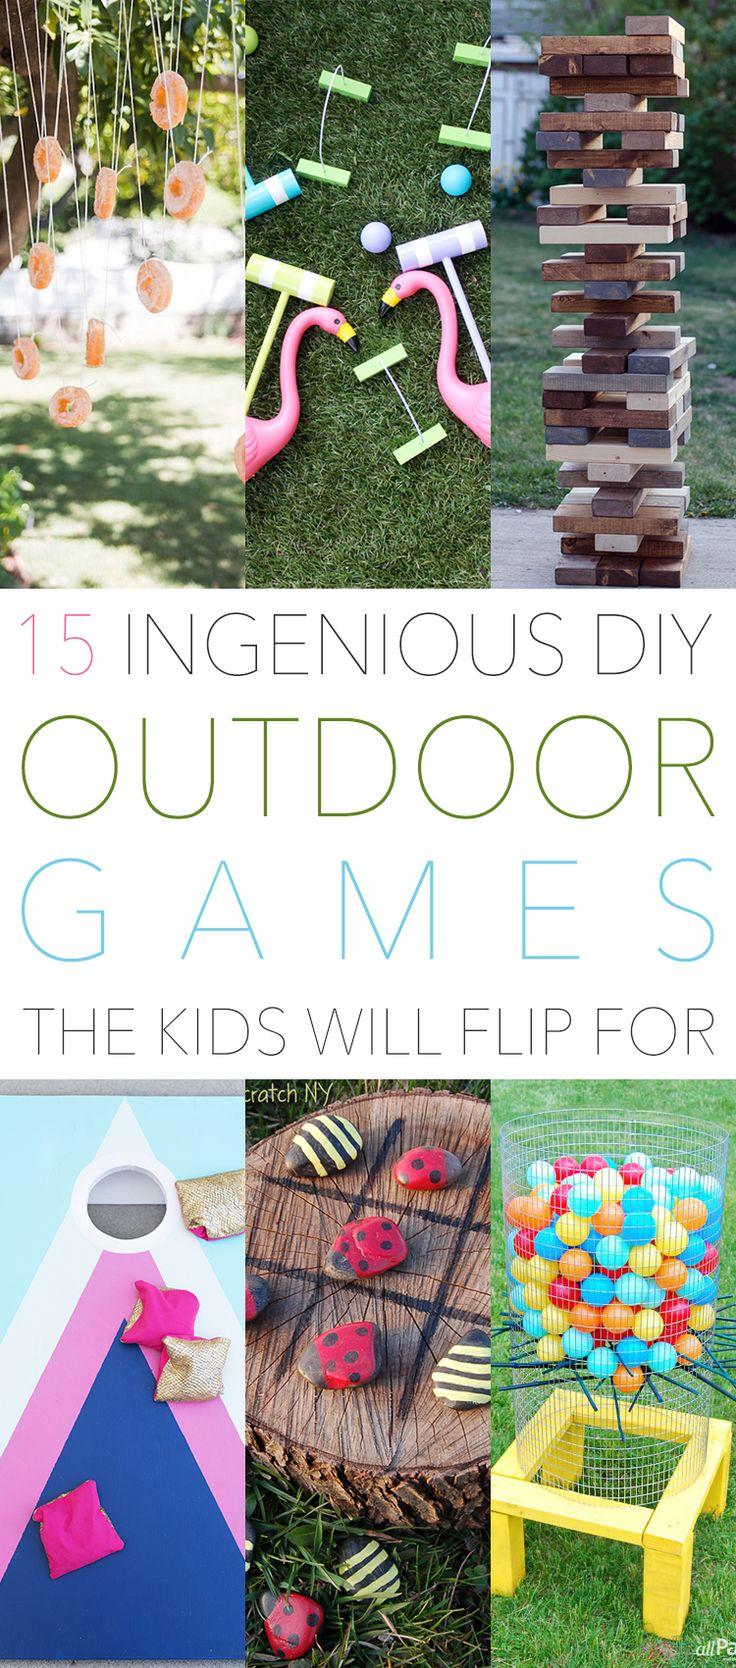 15 Ingenious DIY Outdoor Games The Kids Will Flip For | The Cottage Market | Bloglovin'